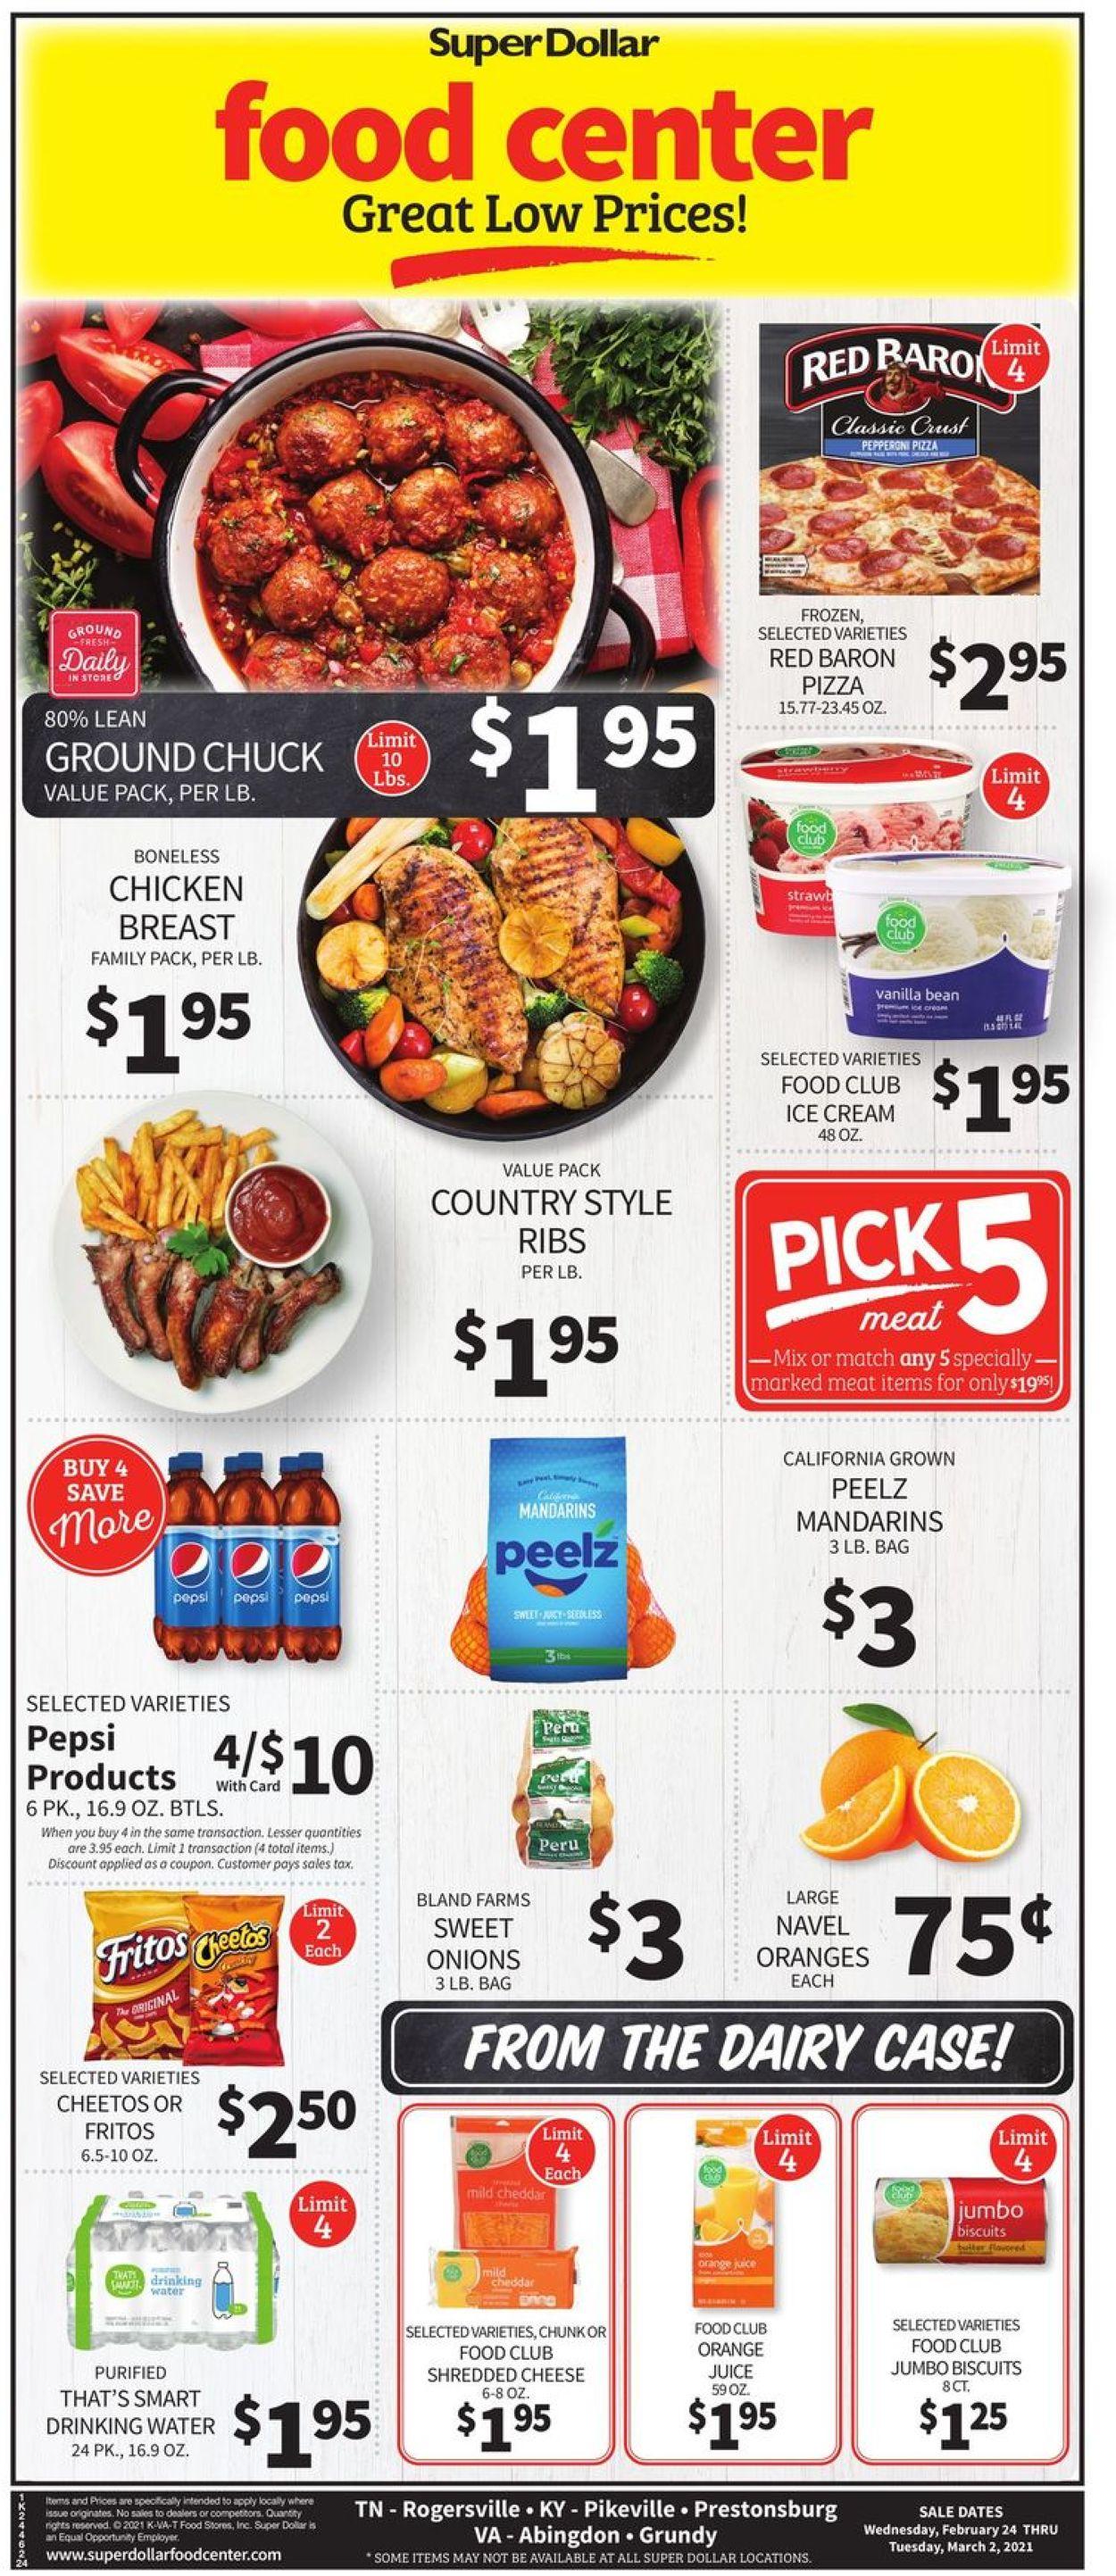 Super Dollar Food Center Weekly Ad Circular - valid 02/24-03/02/2021